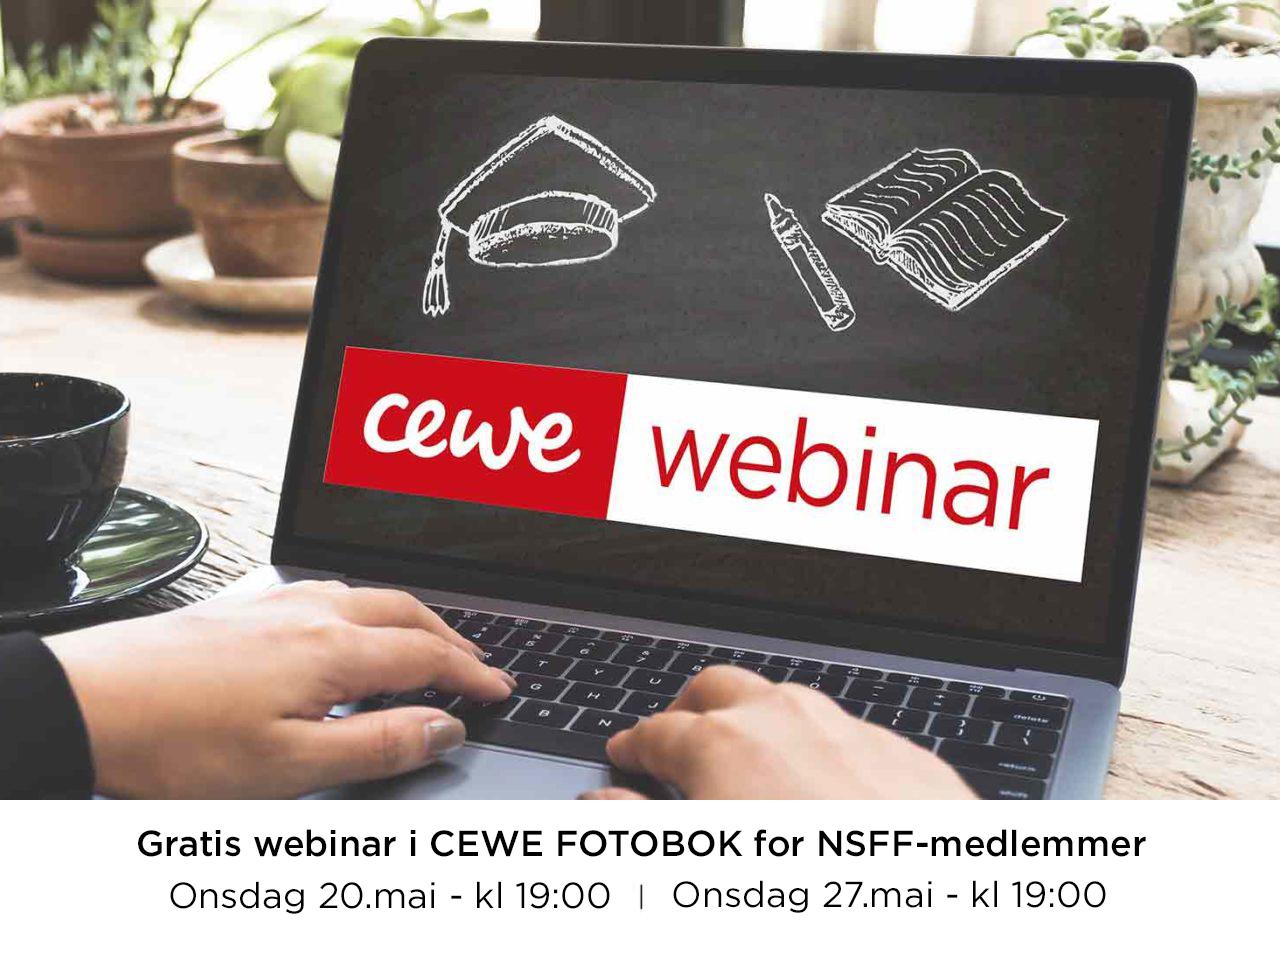 Webinar CEWE fotobok for NSFF